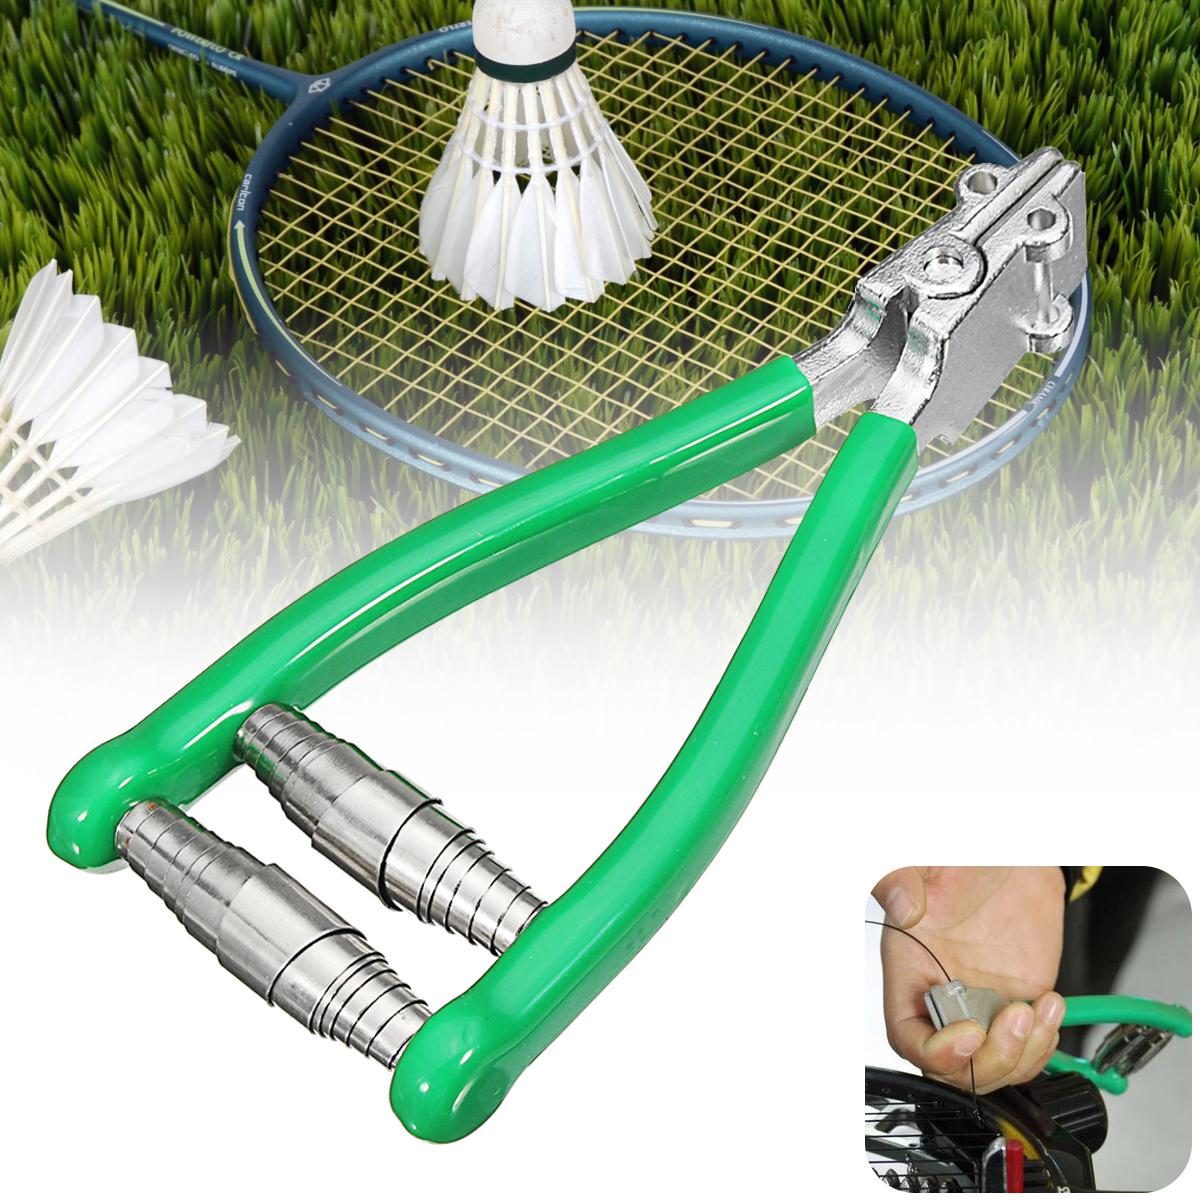 Tennis Starting Clamp Knot Stringing Tool Badminton Racket Racquet